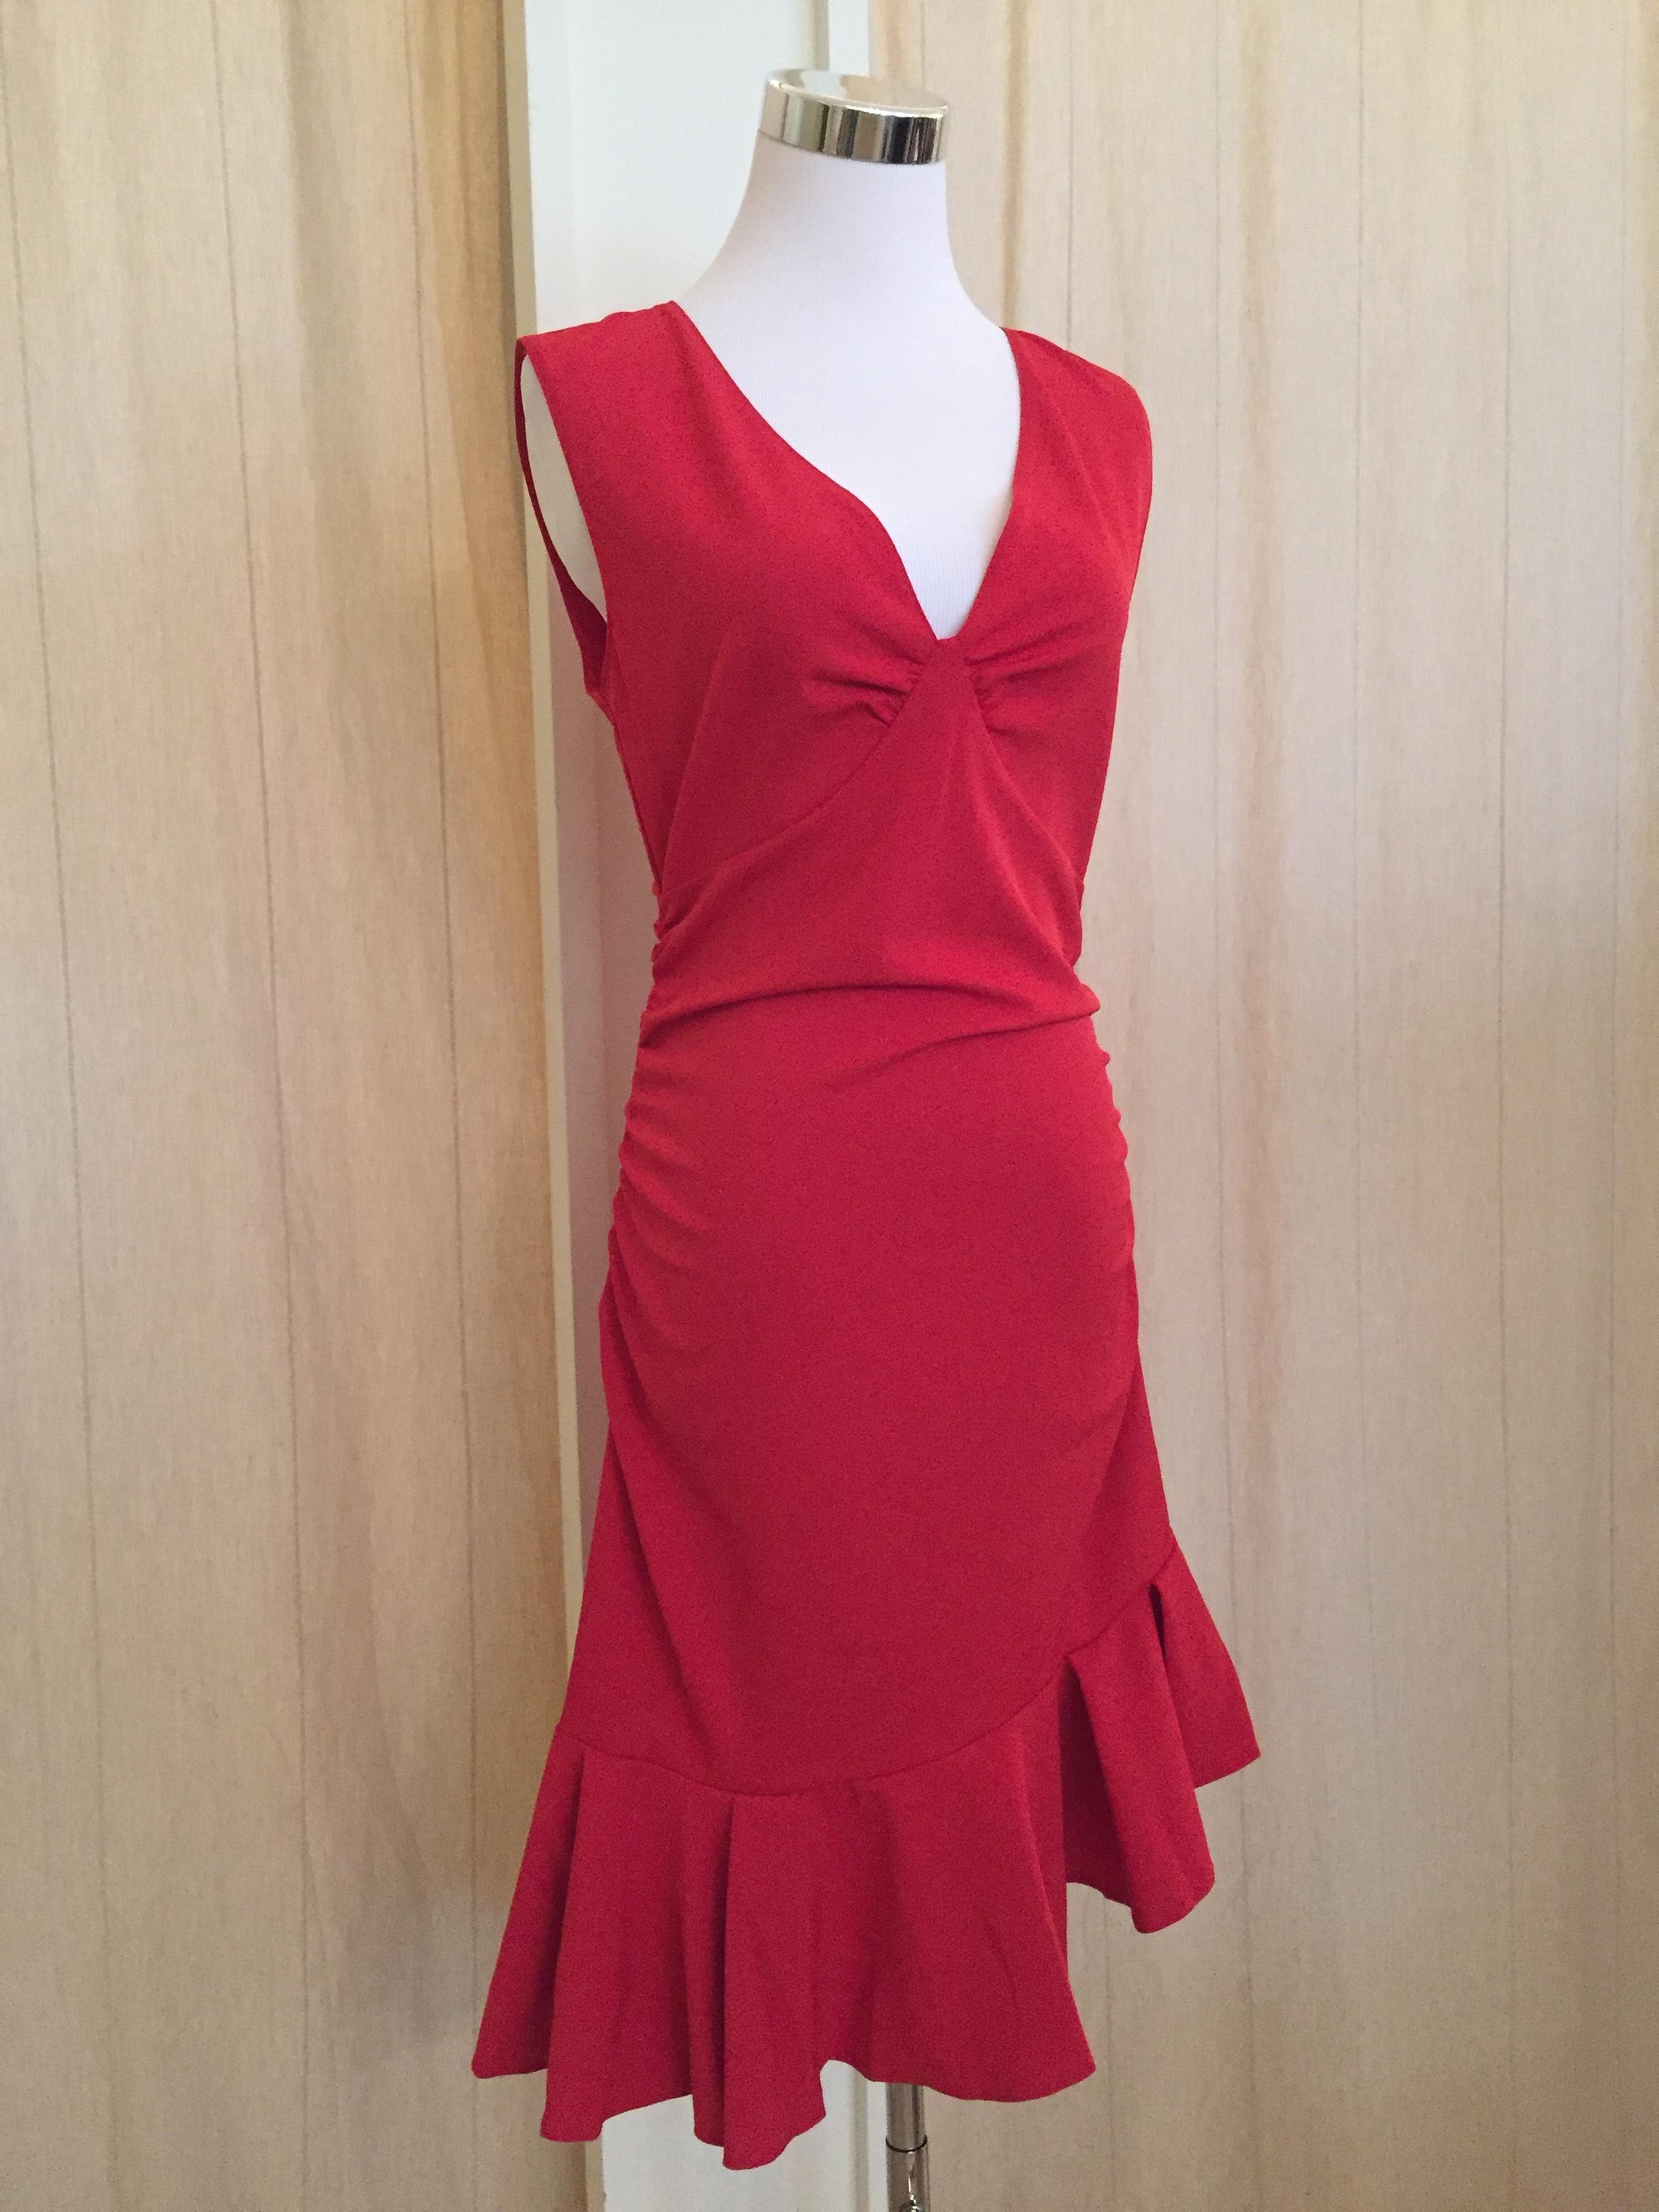 Red ruffle dress $54